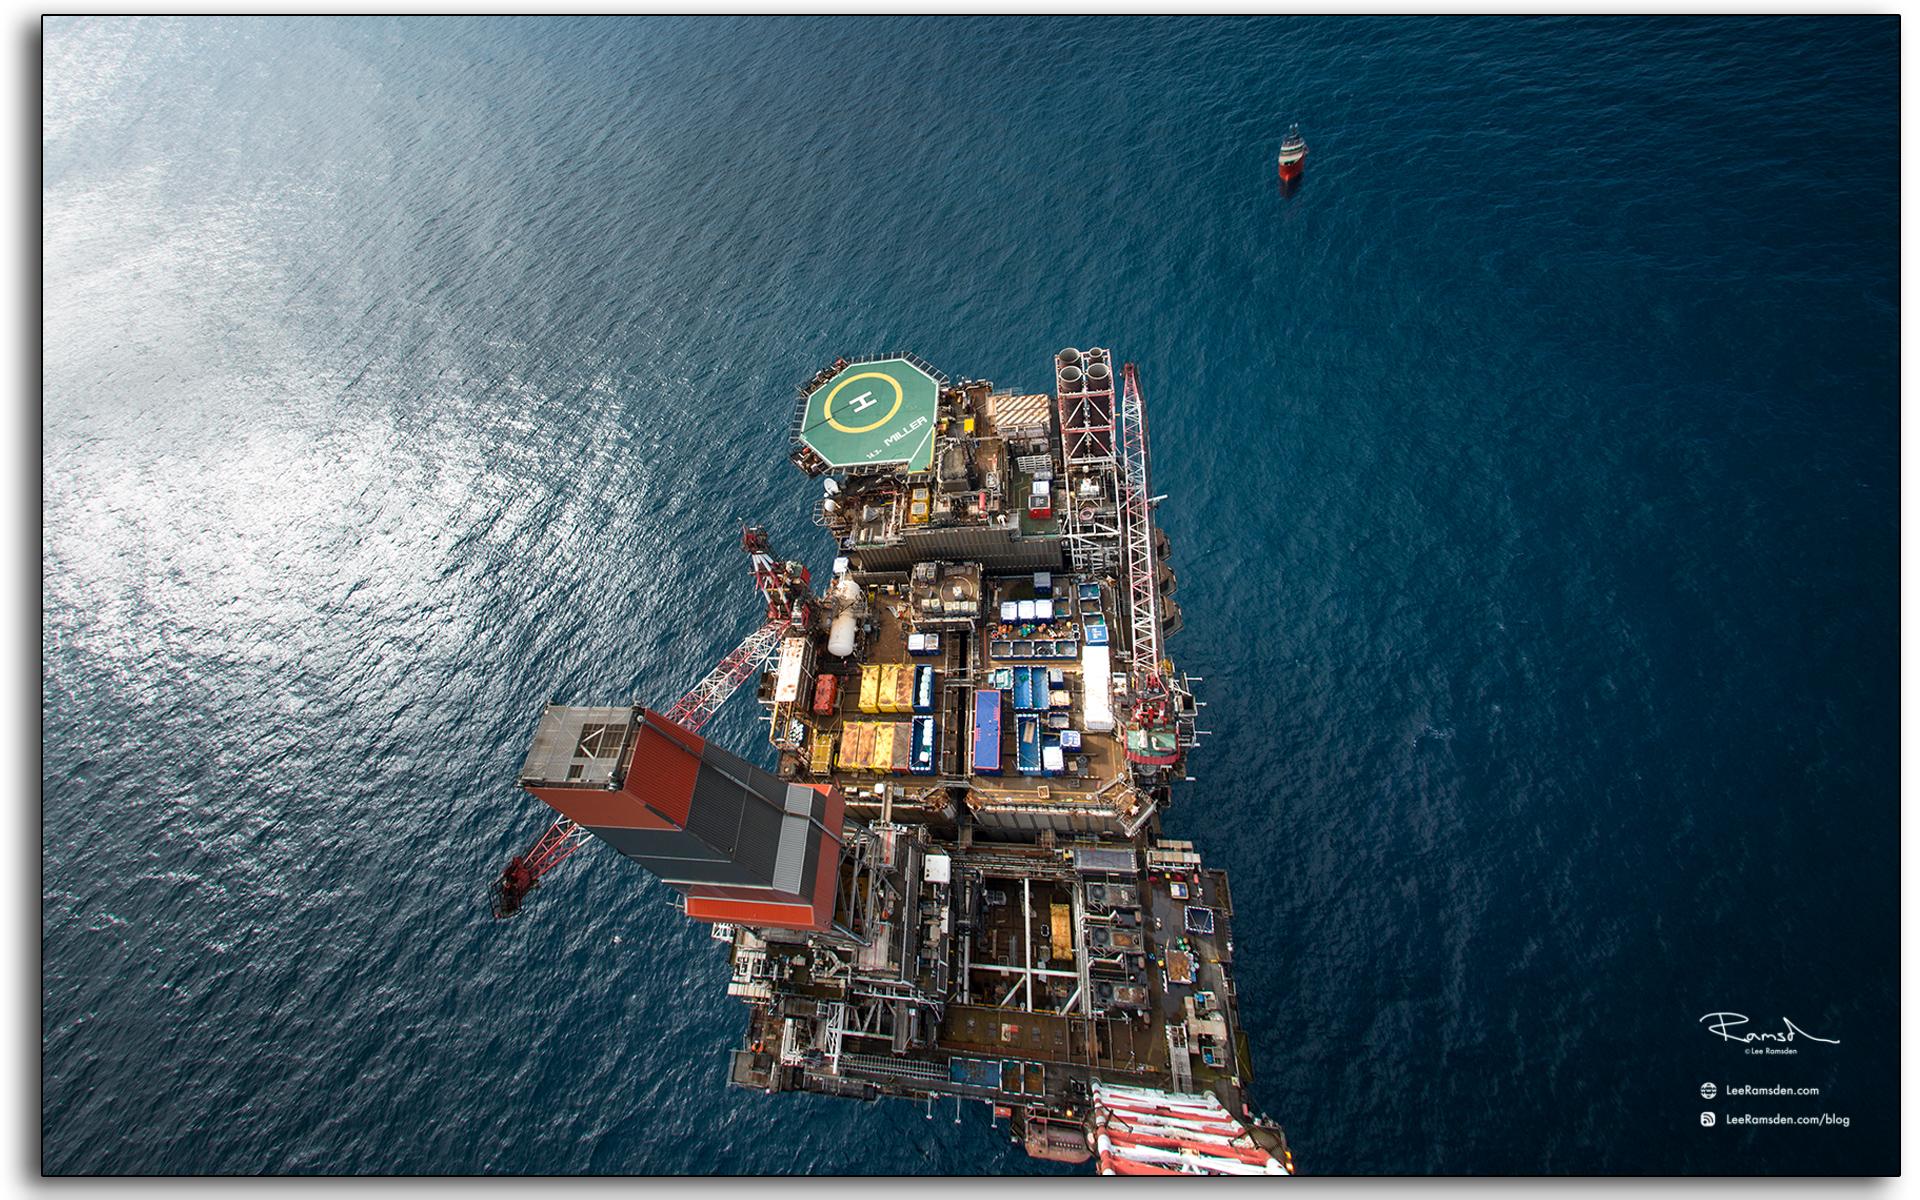 blog, Flare view, heighest point, in the, north sea, 162m, BP Miller, oil, gas, rig, platform, Aberdeen, BP,Petrofac, Saipem, Lee Ramsden industrial photographer